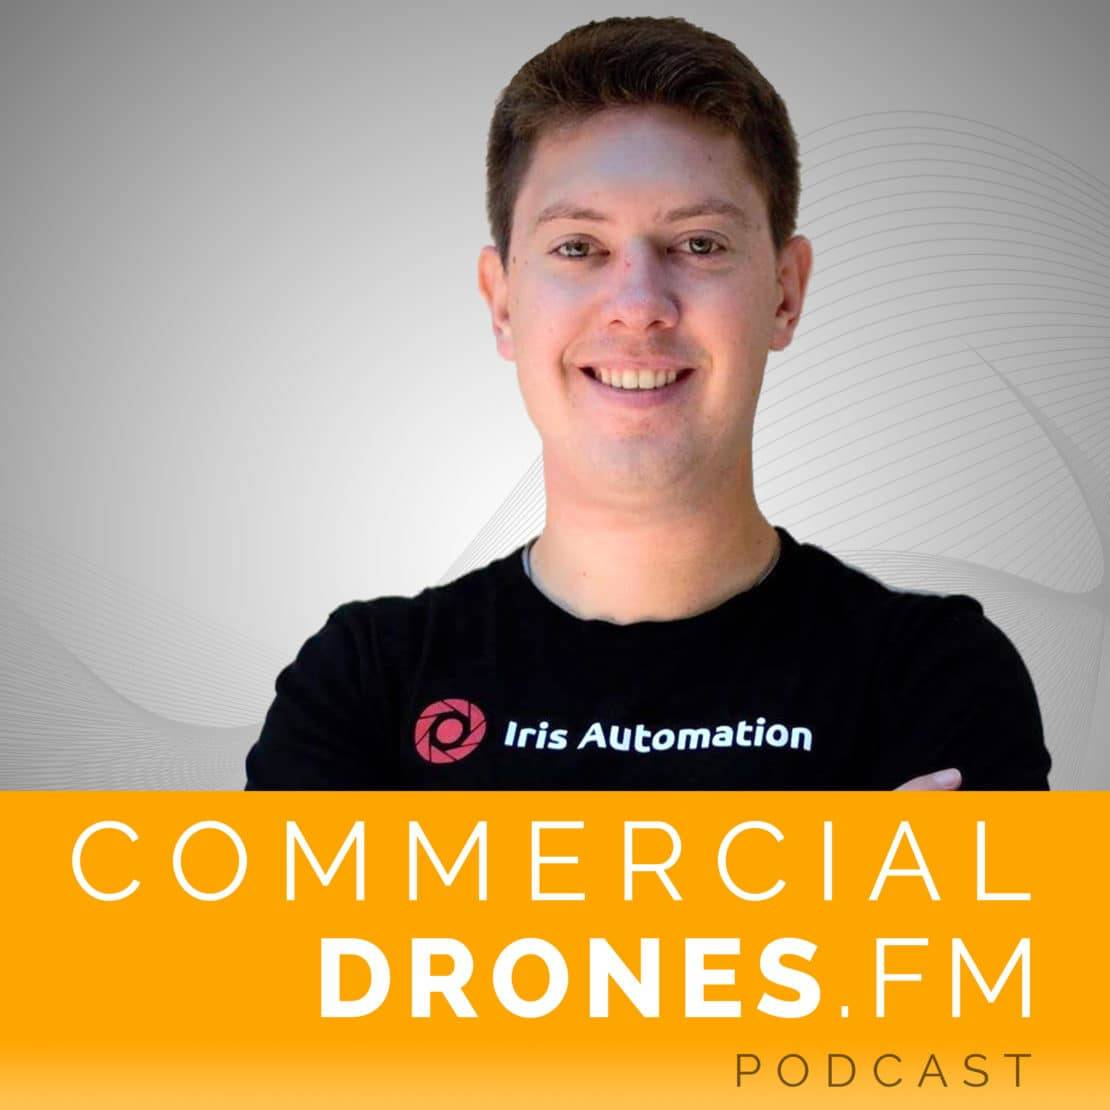 Commercial Drones FM Podcast - Alexander Harmsen Iris Automation - Computer Vision Drones